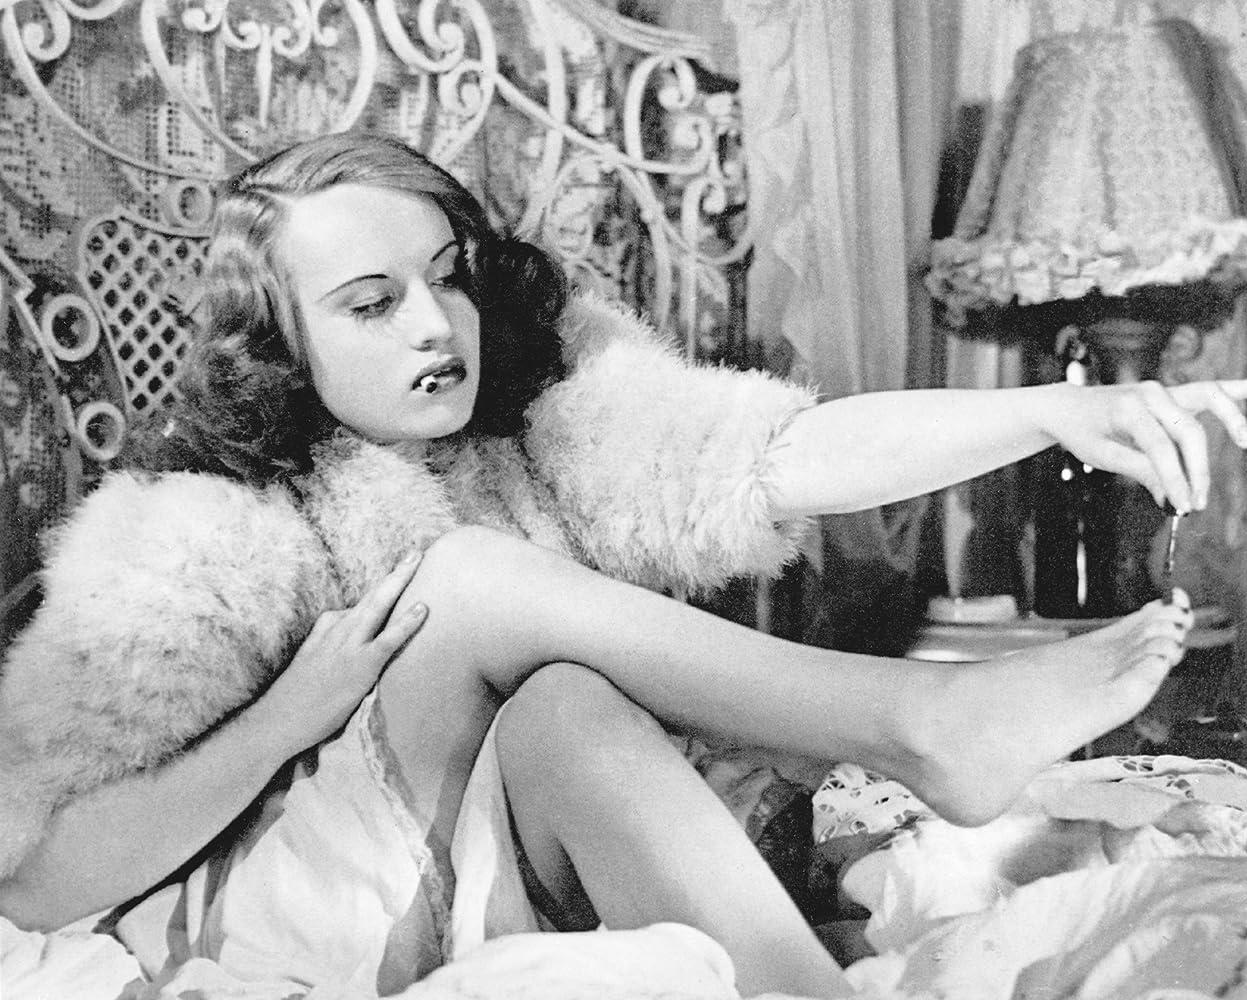 Ginette Leclerc in Le corbeau (1943)